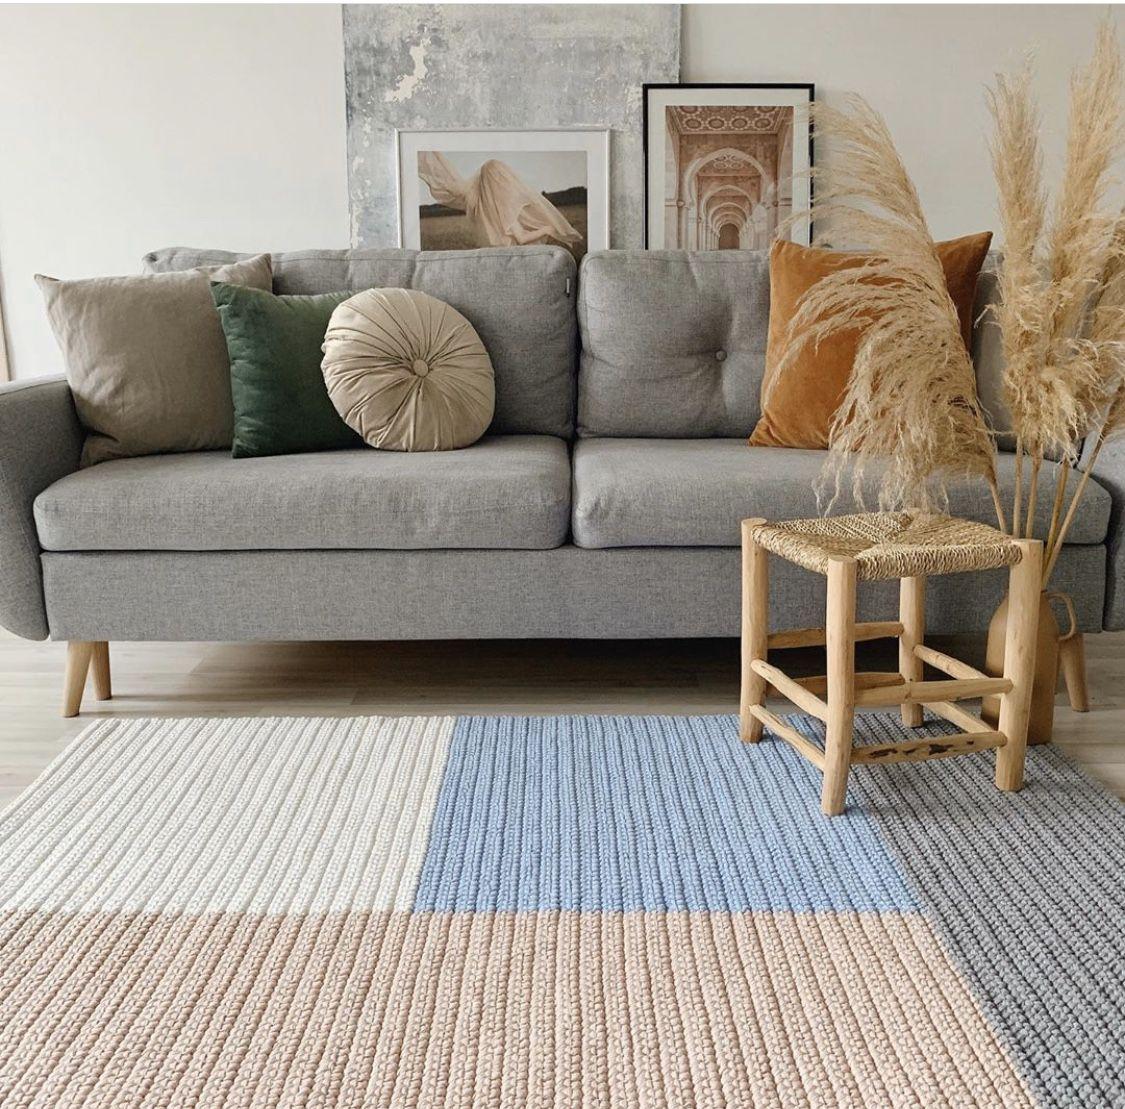 100% cotton rugs, handmade, washable